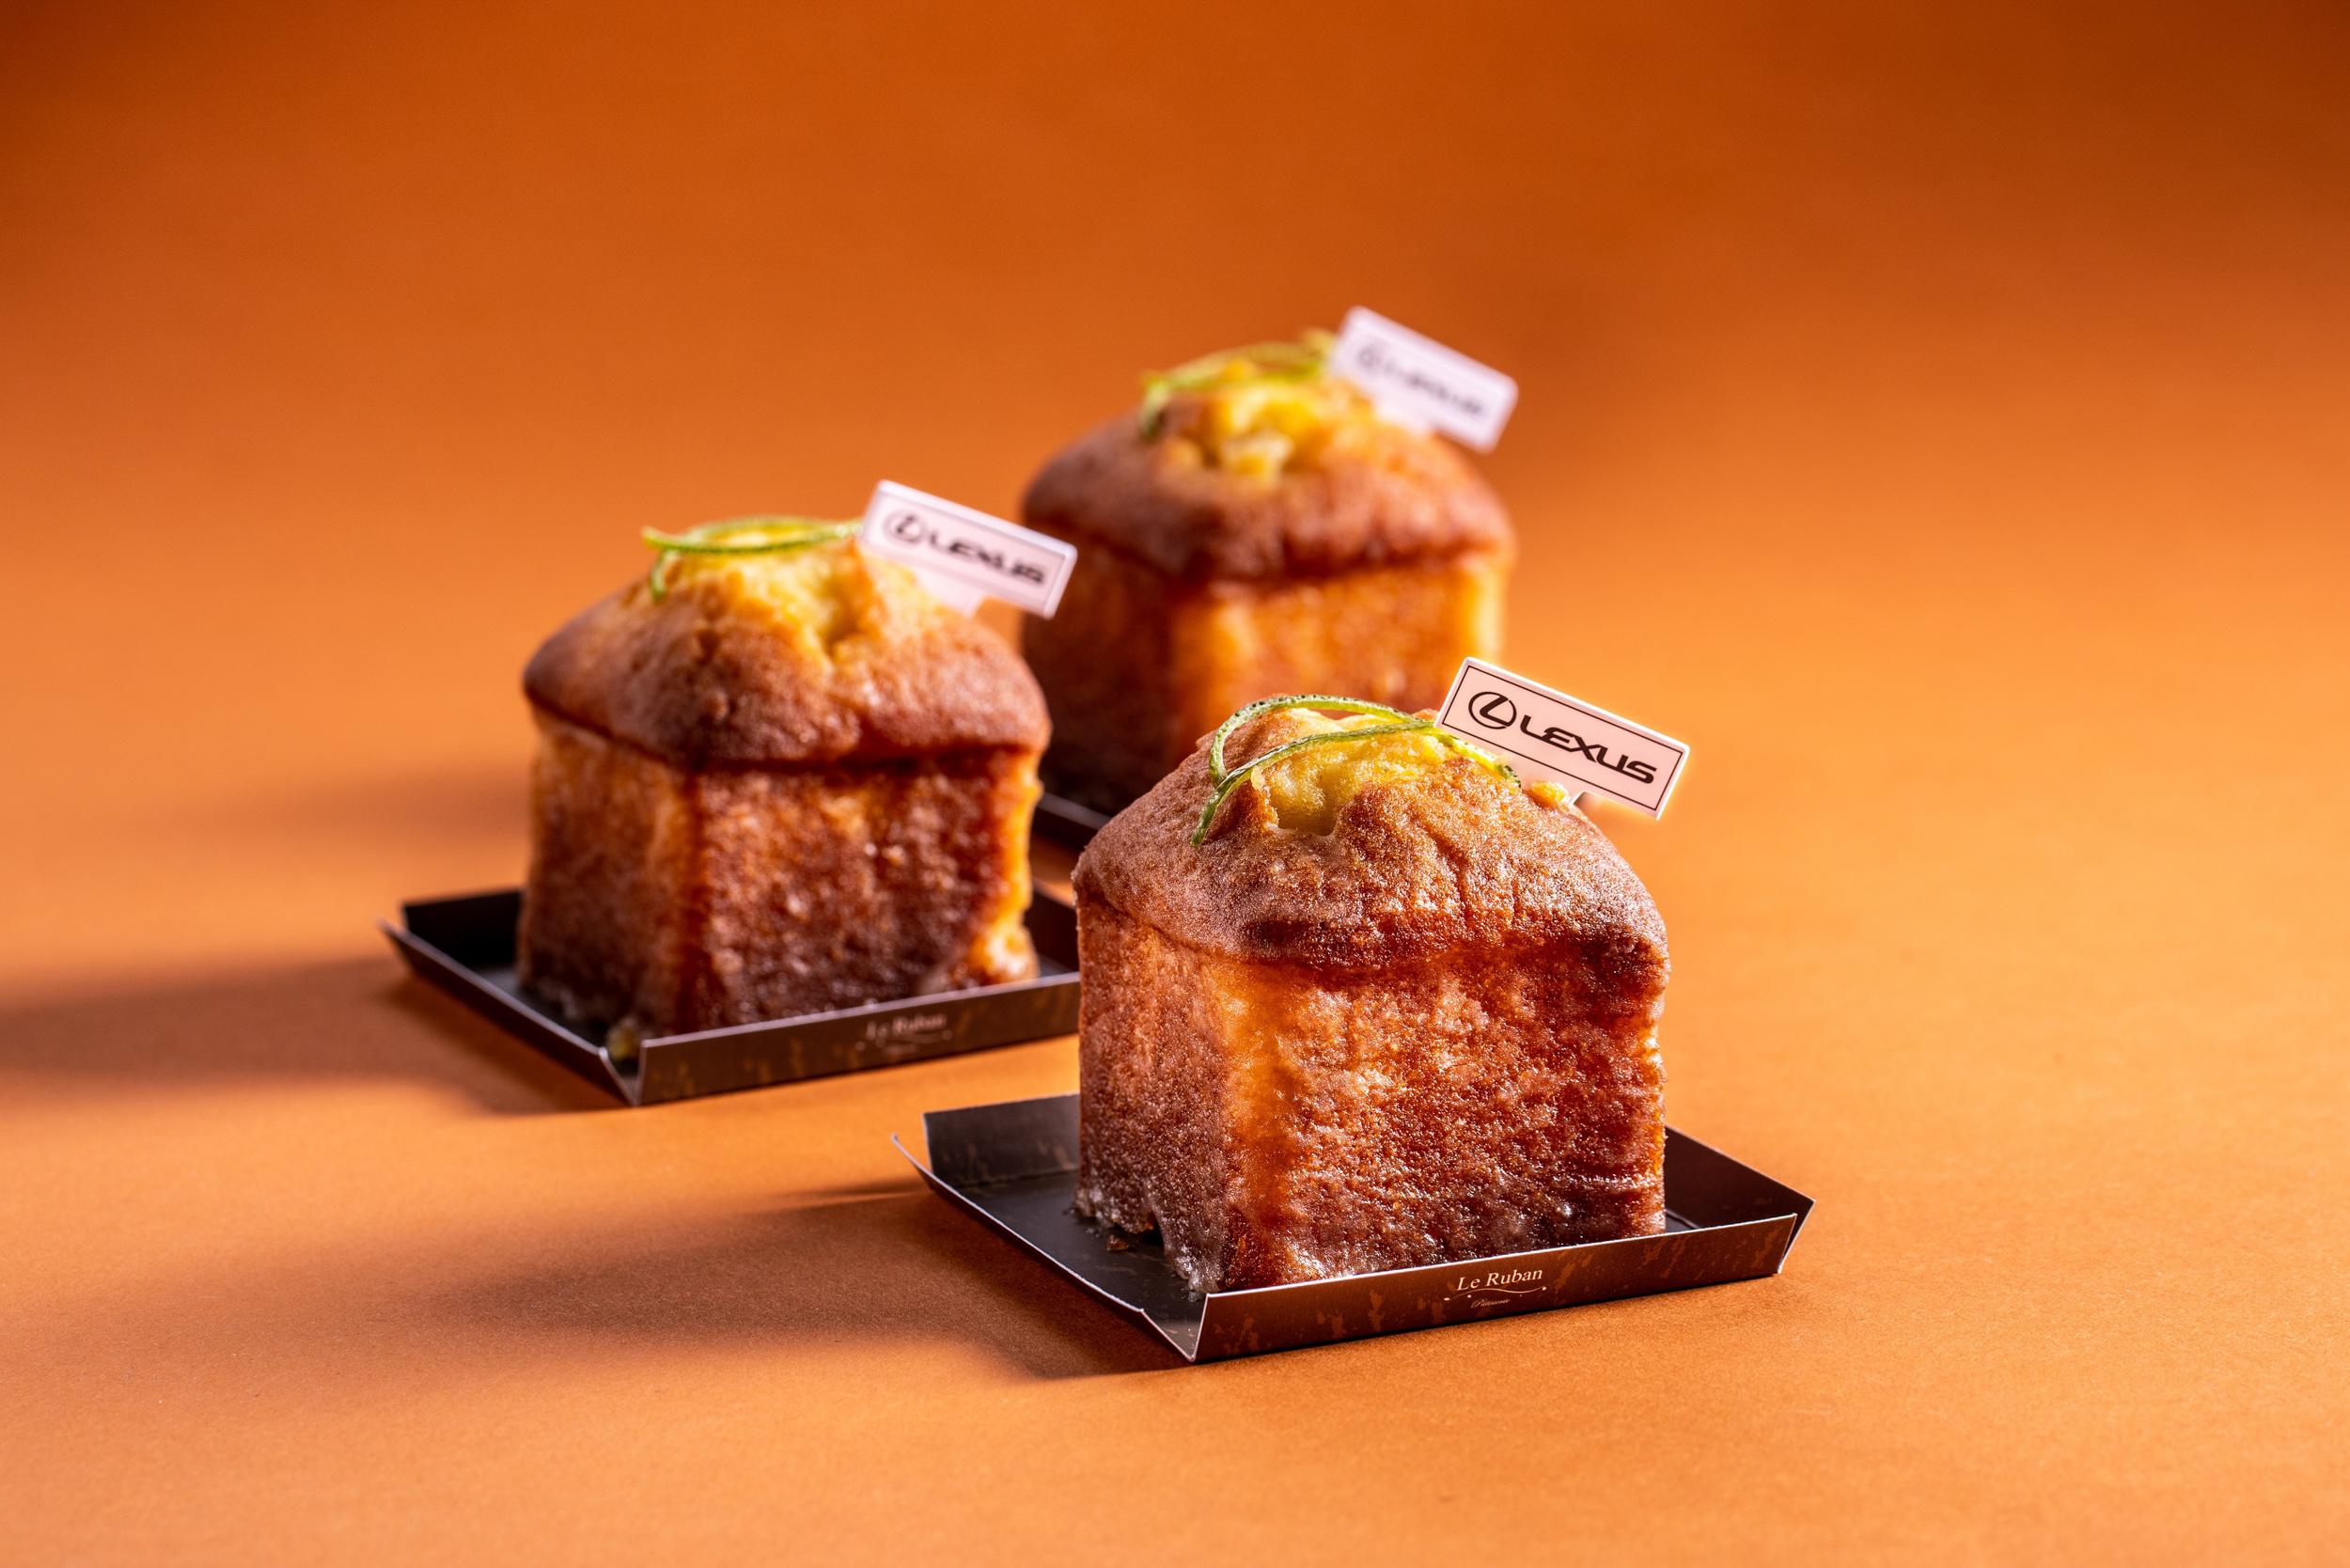 「Lexus 檸檬蛋糕」以經典檸檬糖霜和溫潤磅蛋糕酸甜平衡。